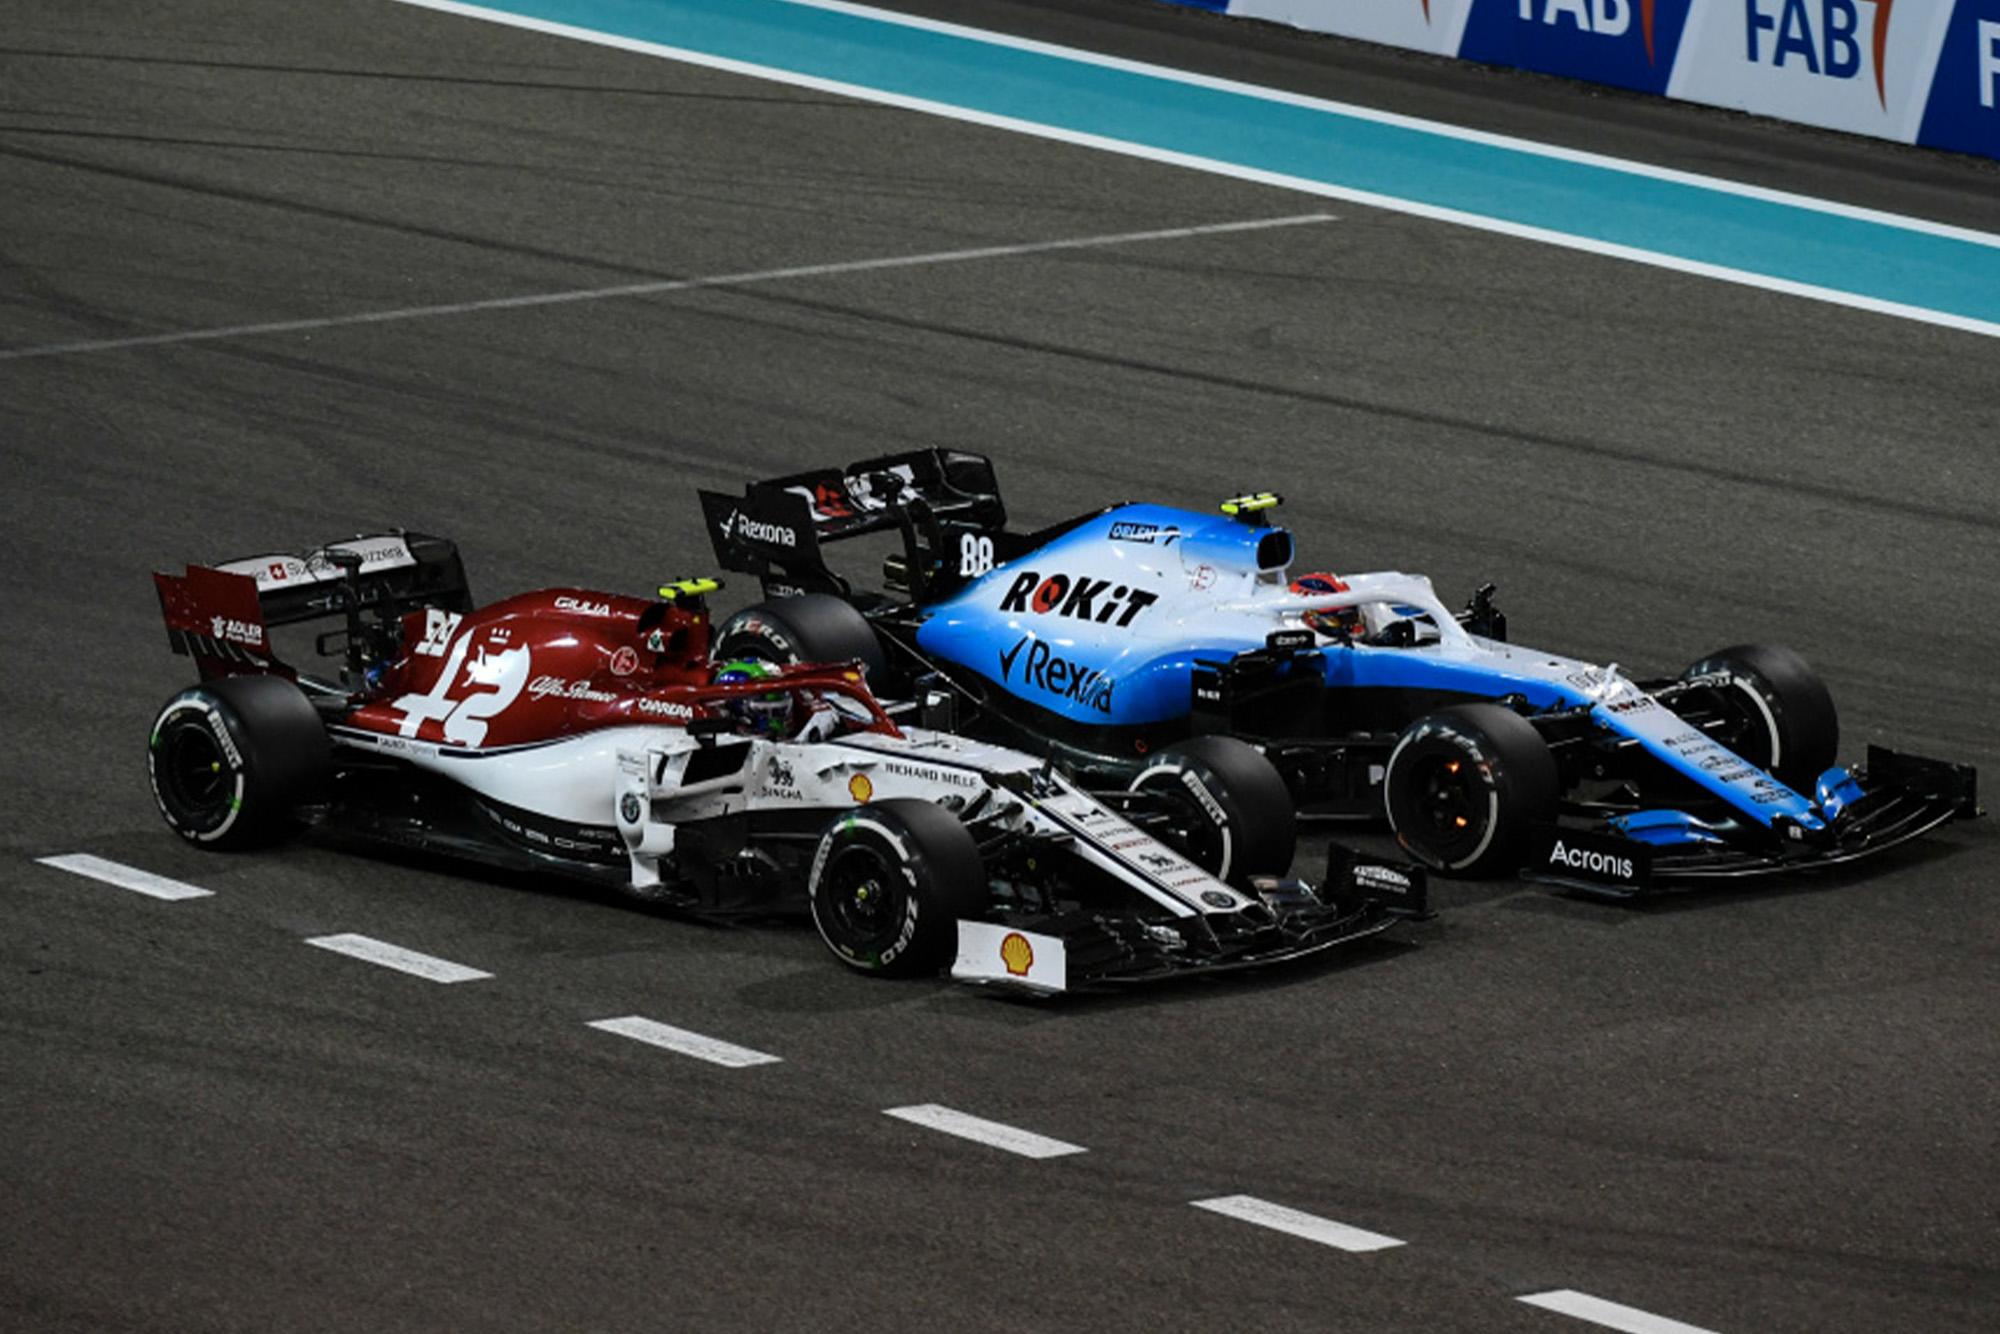 Robert Kubica and Antonio Giovinazzi during the 2019 Abu Dhabi Grand Prix